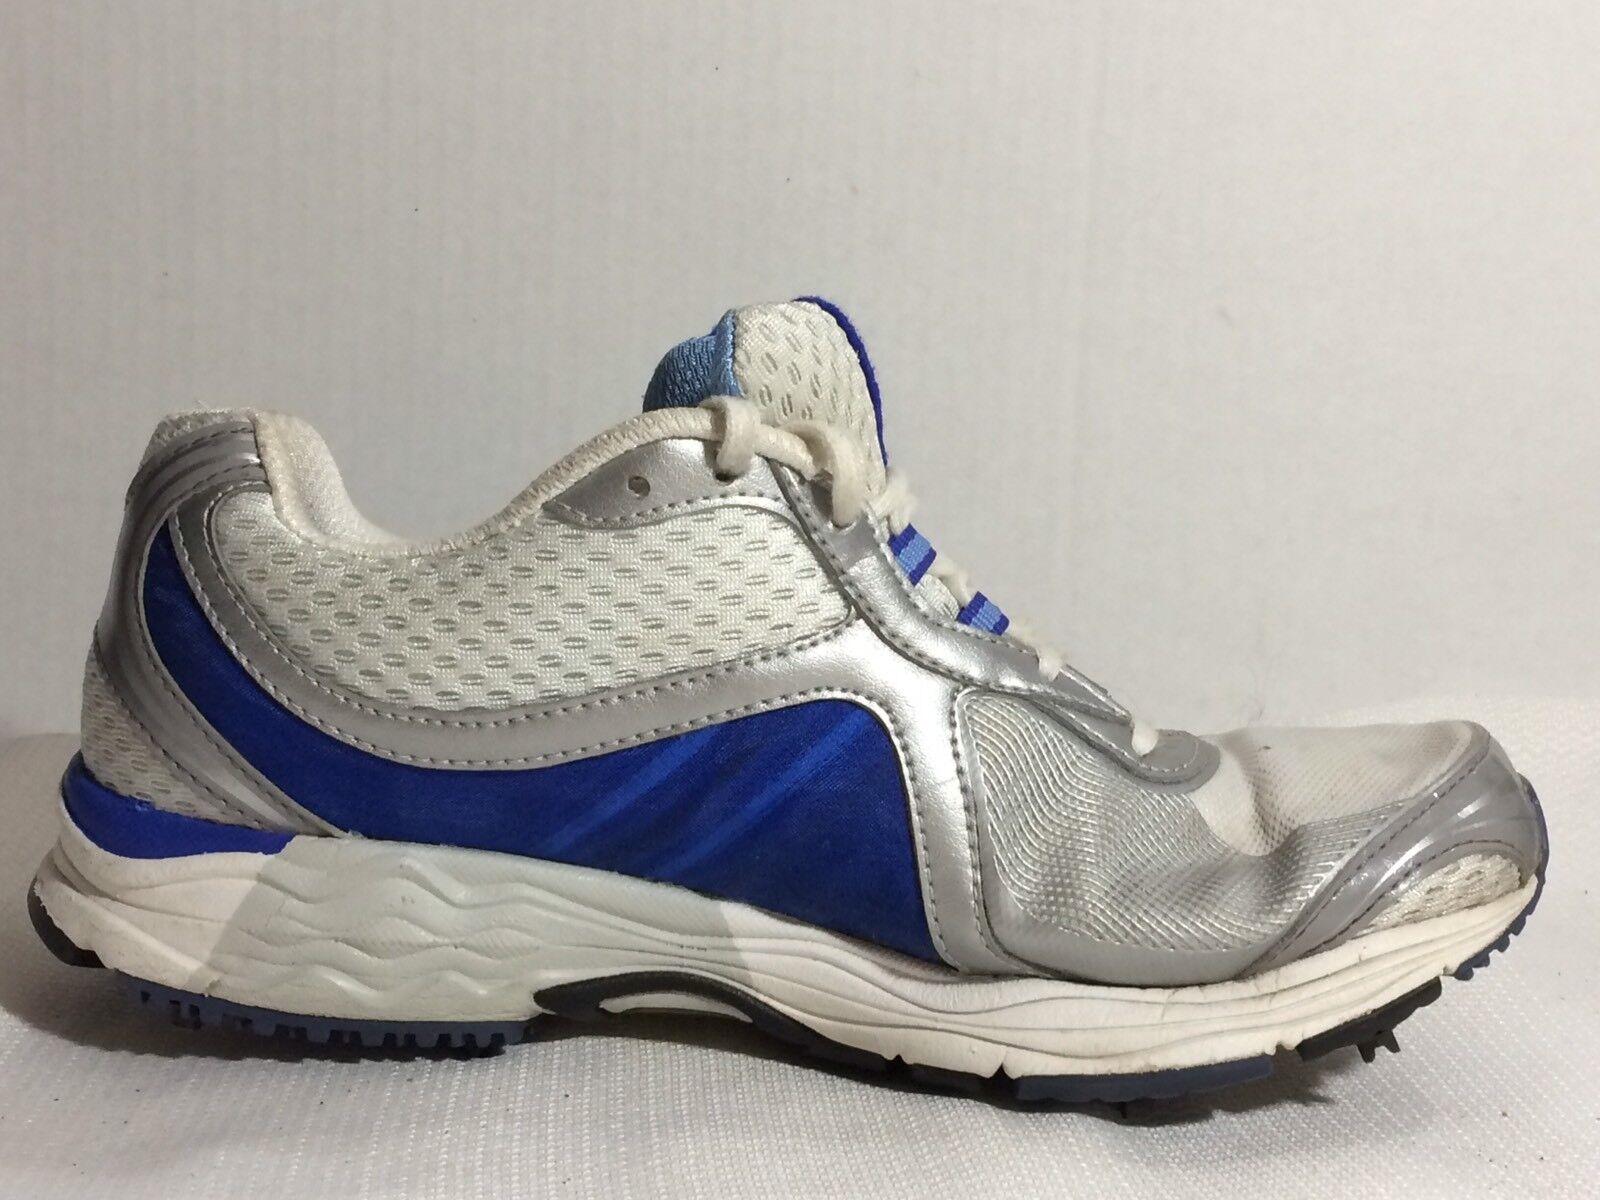 New Running Balance Damenschuhe 8.5 Medium WW1765WB Athletic Running New Schuhes Weiß Blau Sneaker 002acc